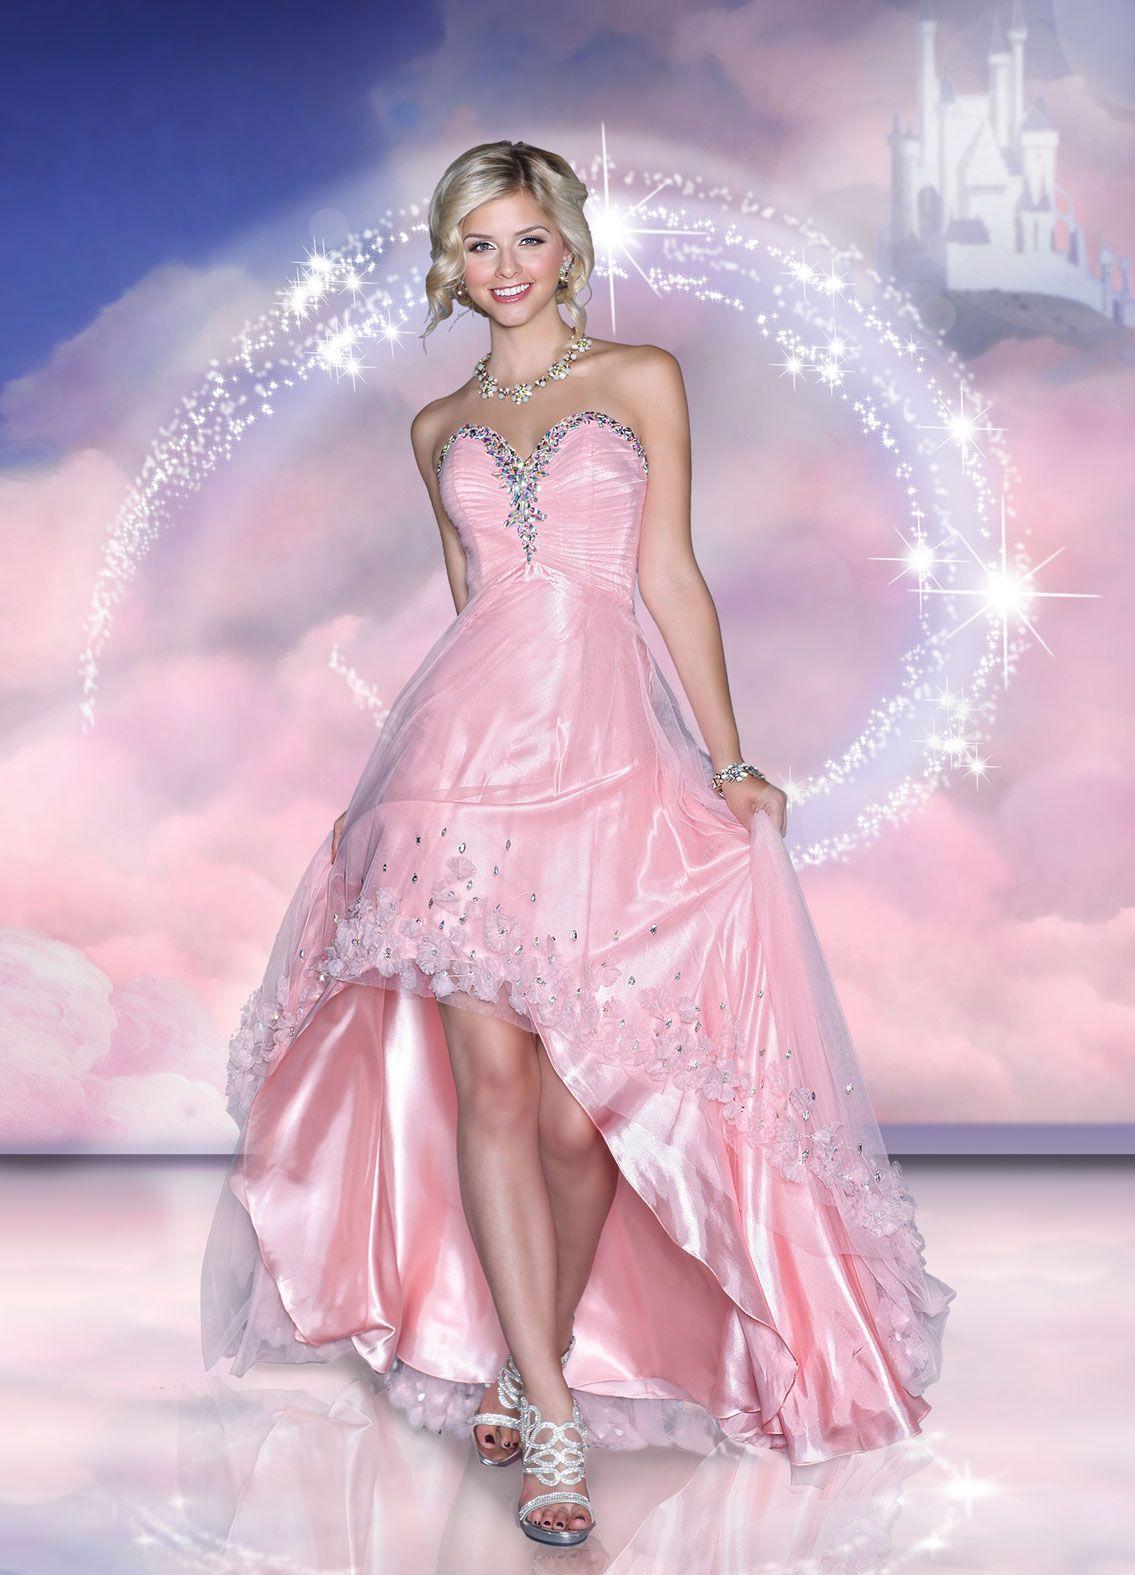 Sleeping Prom Dresses